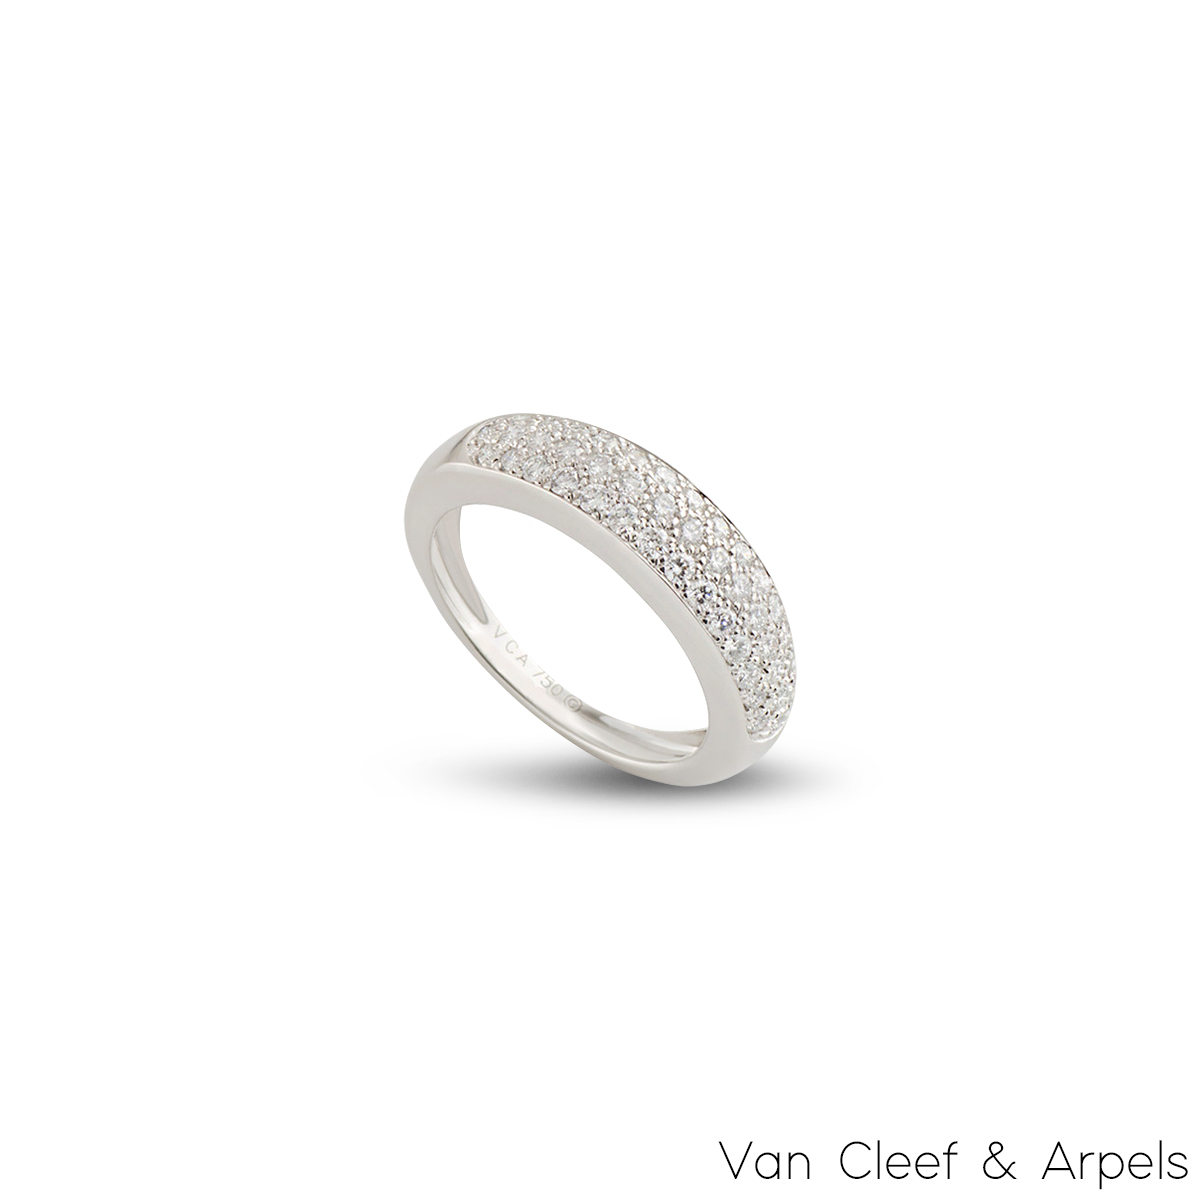 Van Cleef & Arpels White Gold Diamond Ring 0.56ct F/VS+